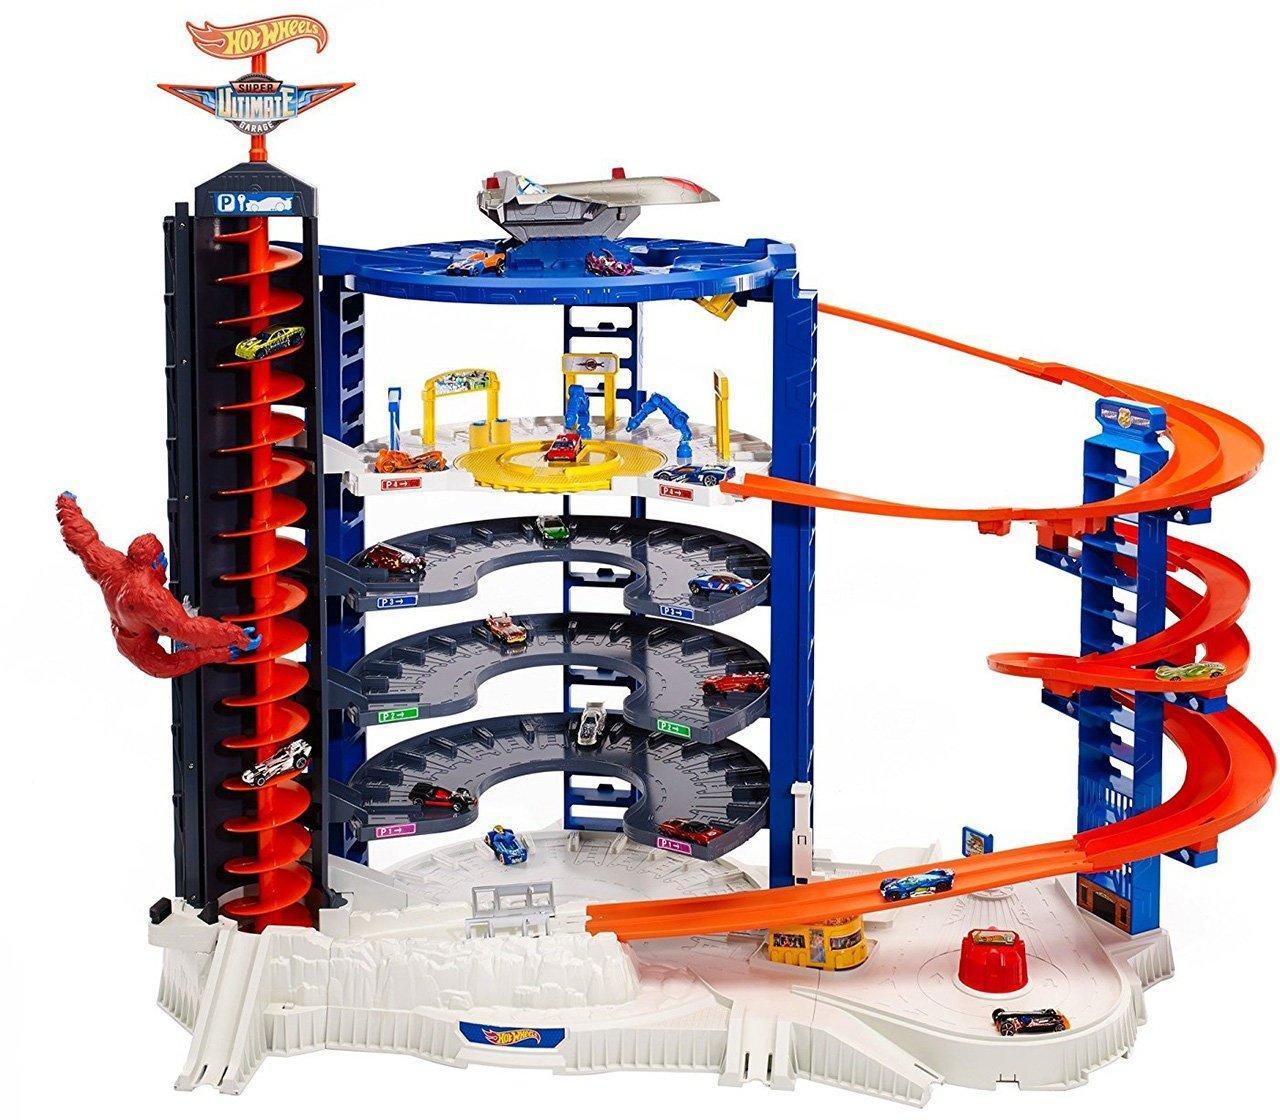 Hot Wheels Super Ultimate Garage Супер гараж гигант ( Хот Вилс гараж с гориллой Парковка Ультиматум )